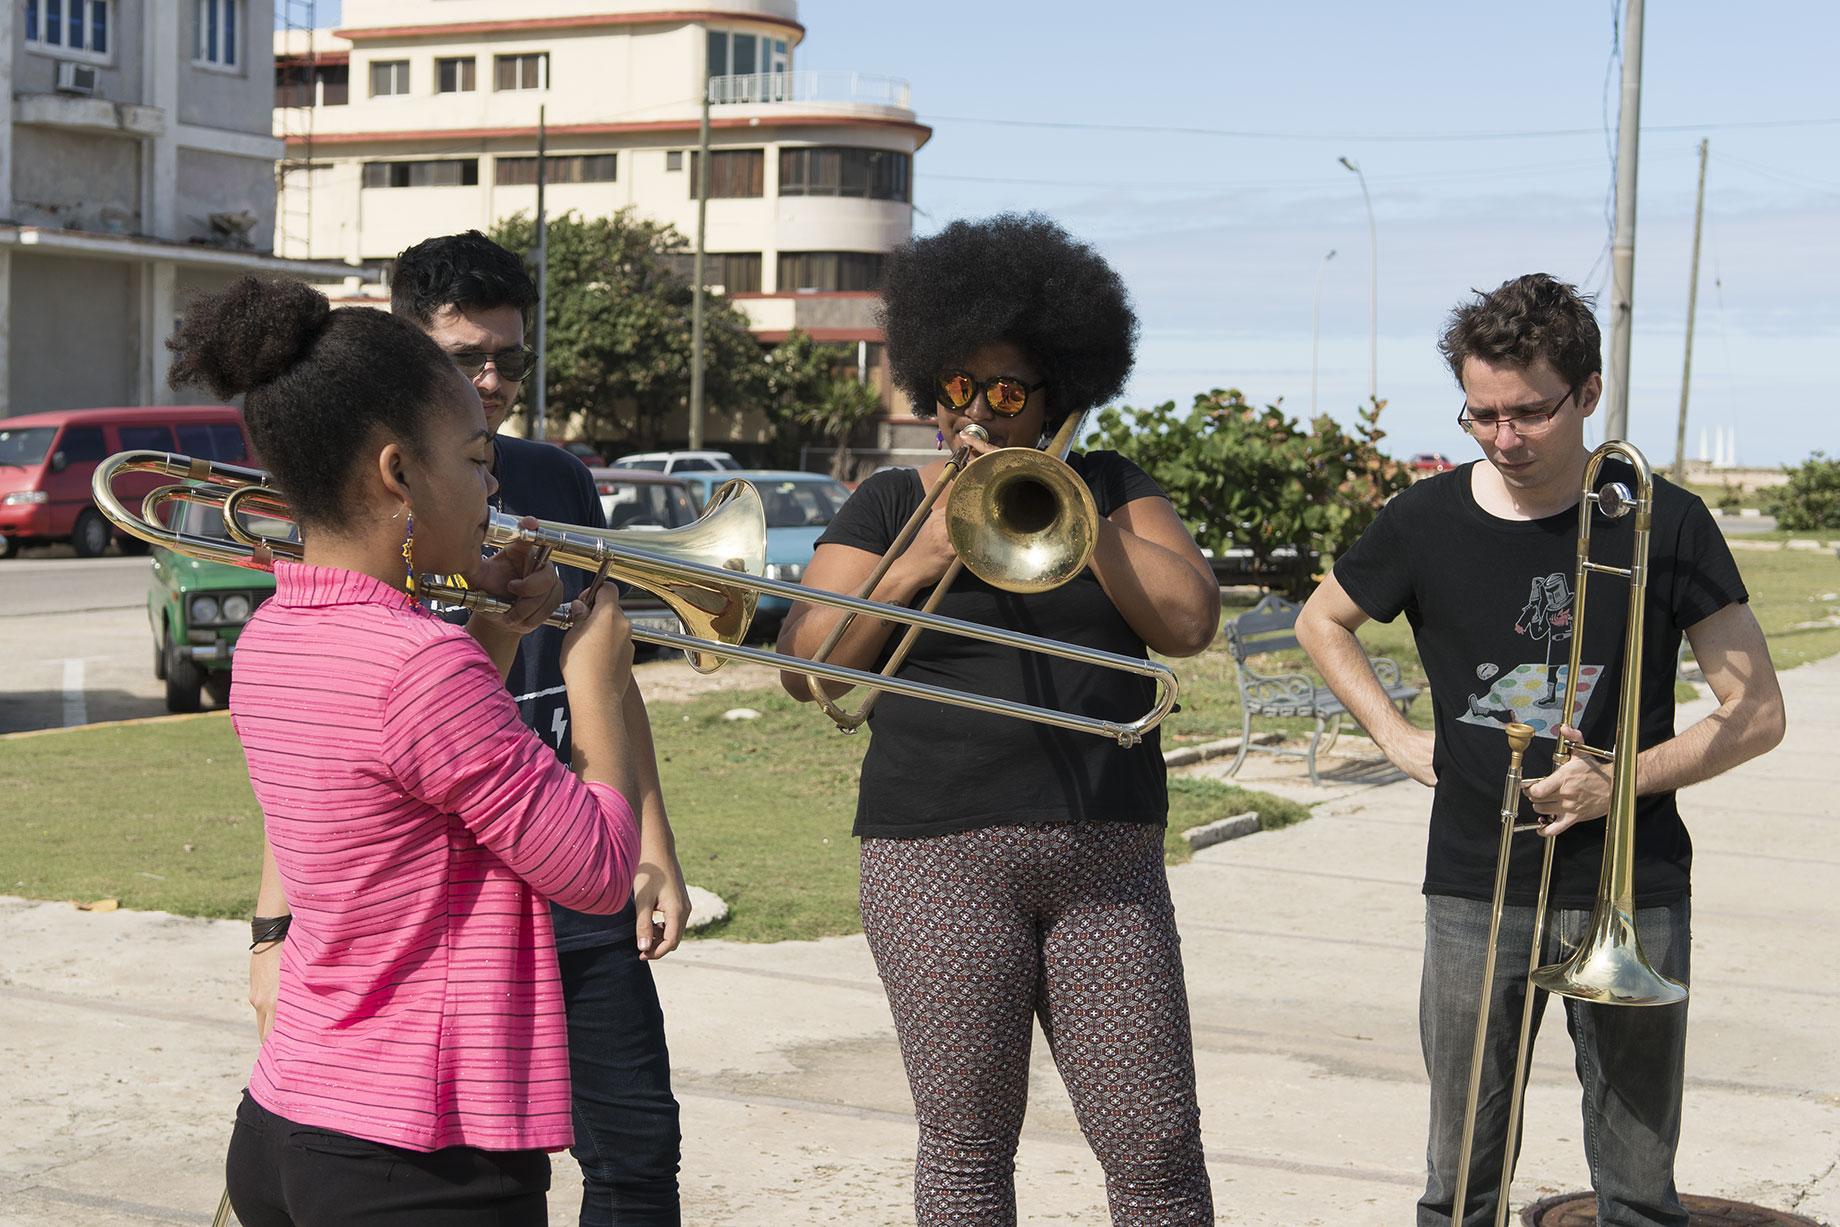 Archivé: Granma. Les trombones de La Havane de Stefan Kaegi – Rimini Protokol